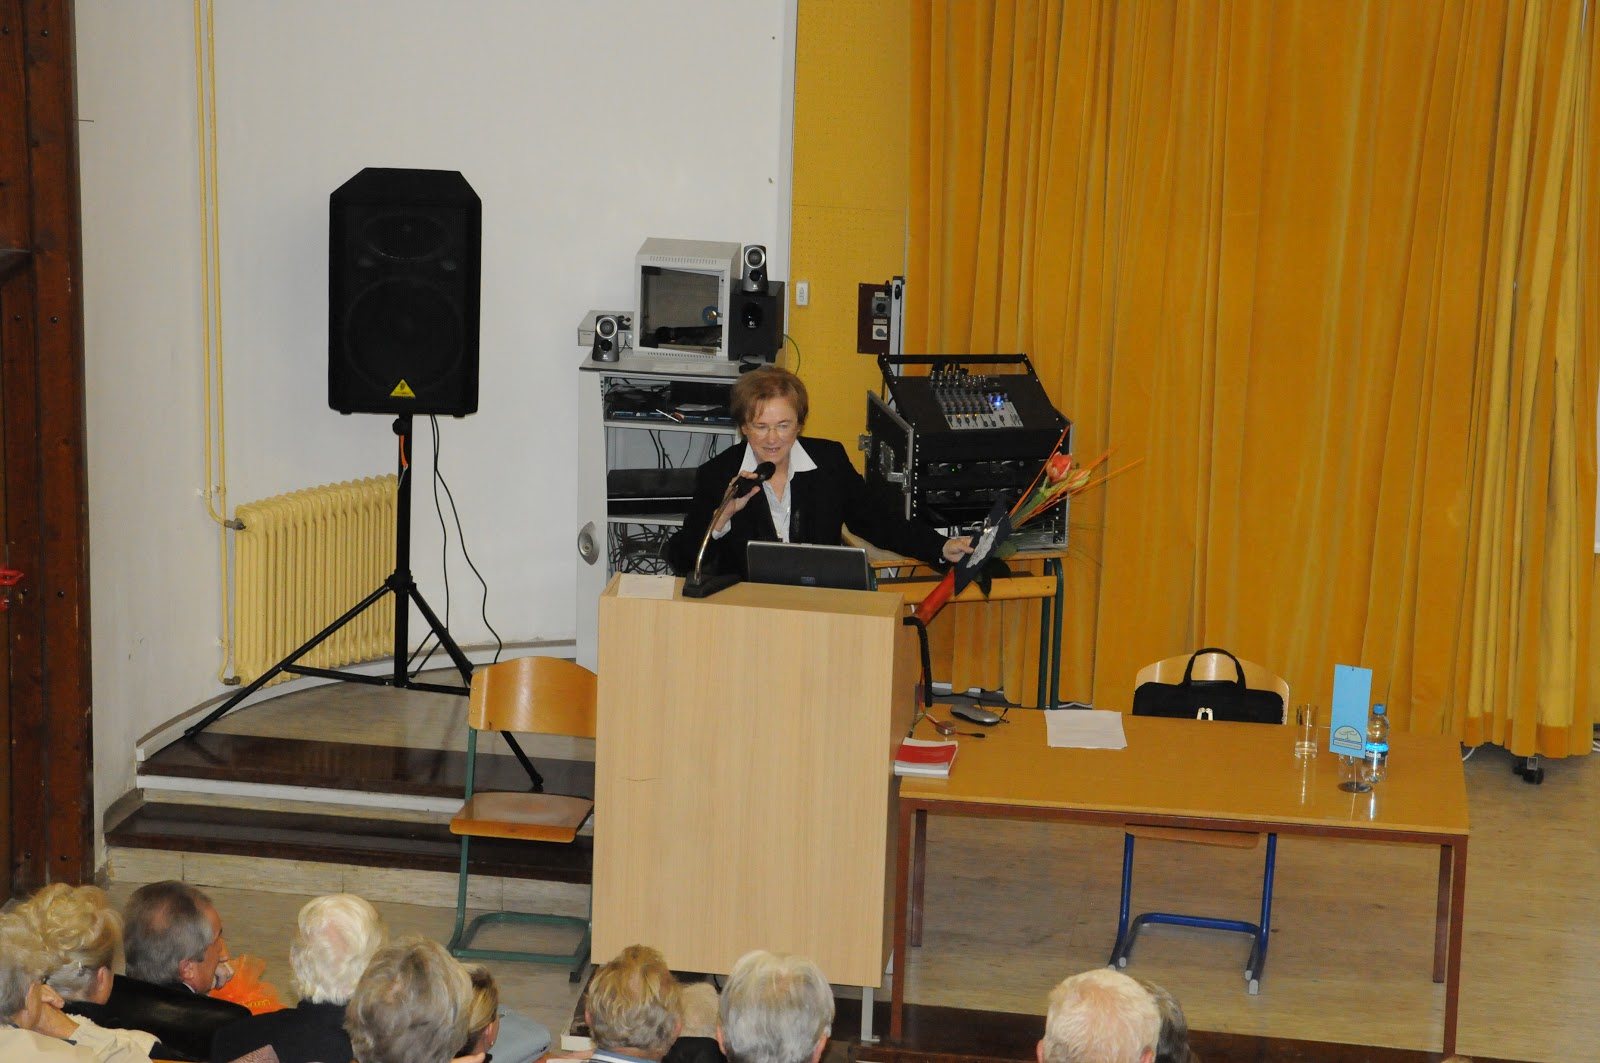 Predavanje, dr. Camlek - oktober 2011 - DSC_3893.JPG